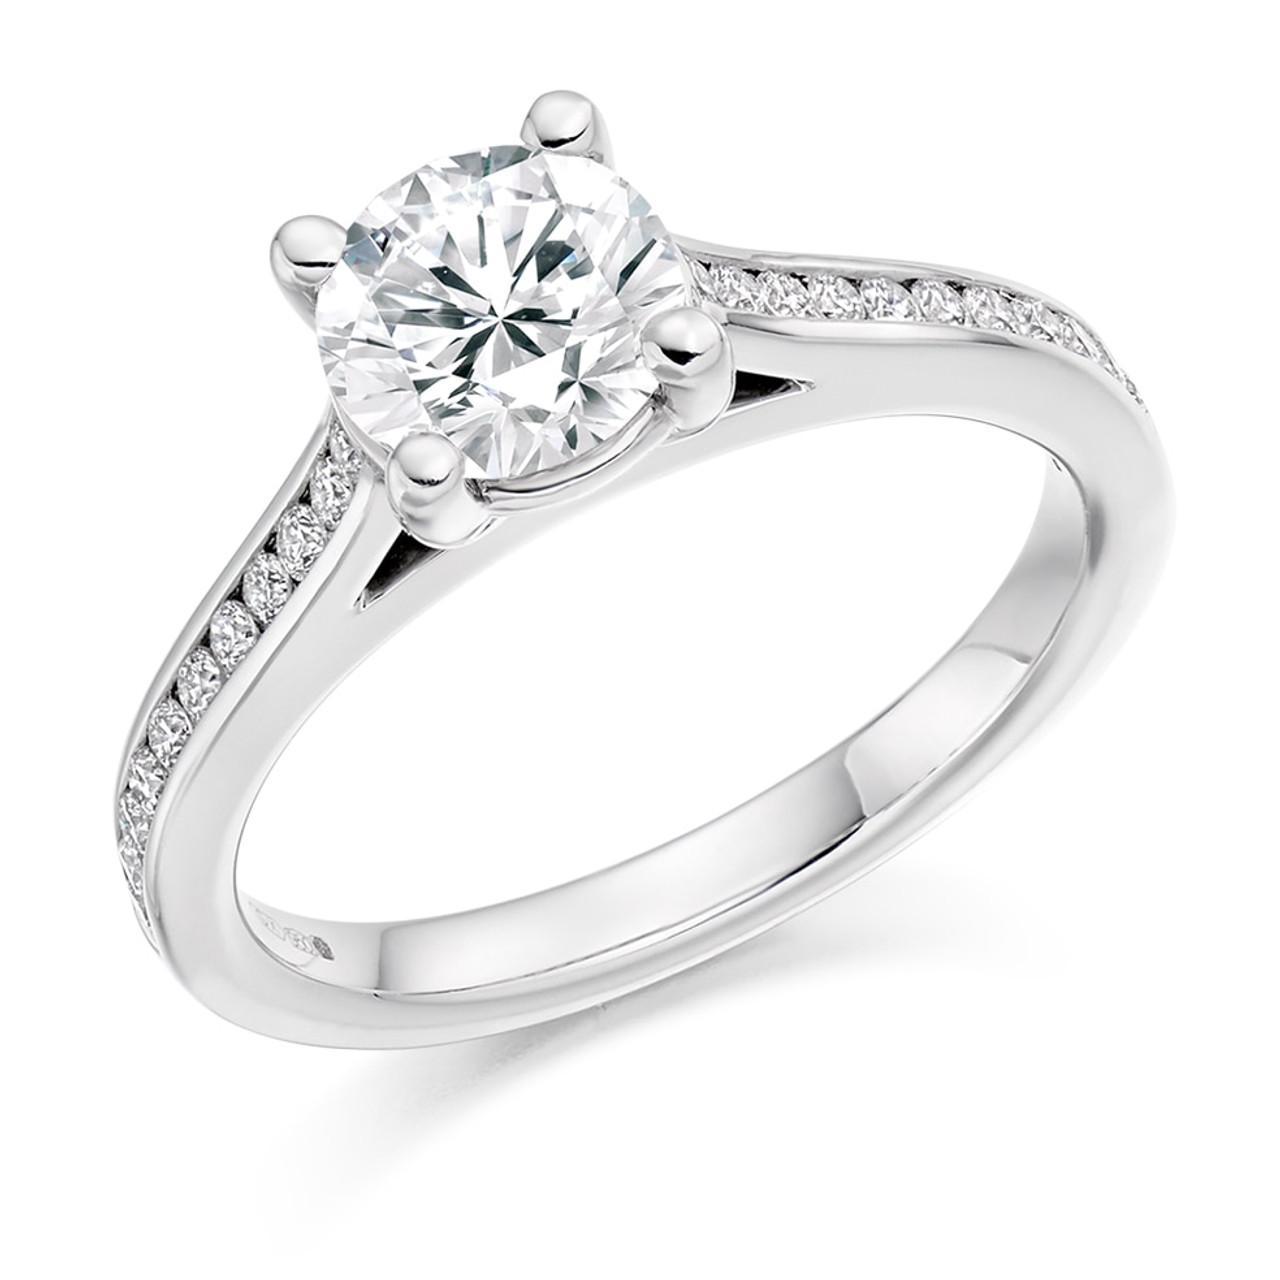 Hawthorn 1.00ct Diamond Engagement Ring